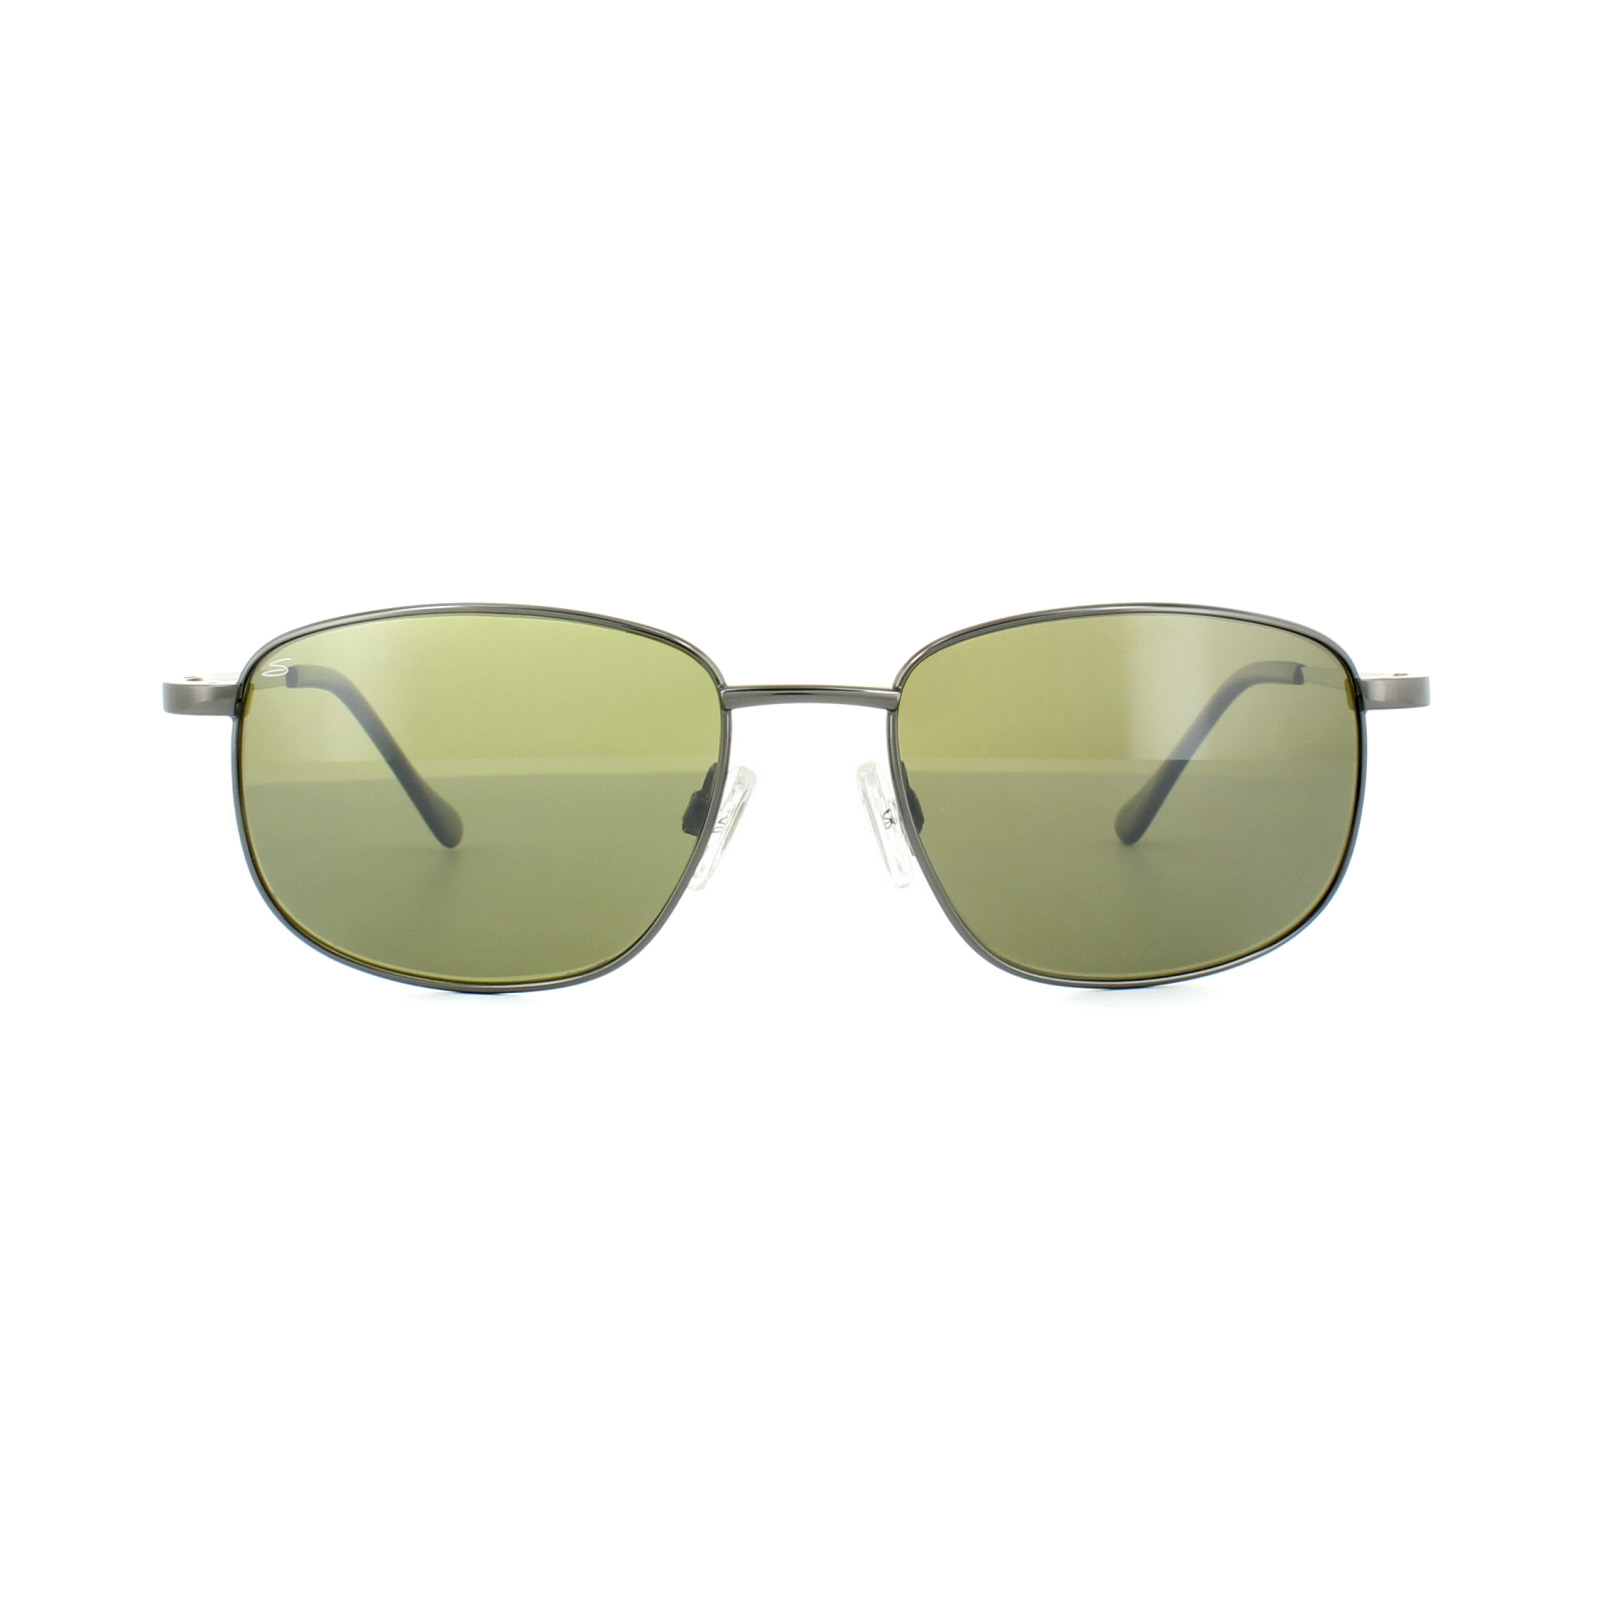 Serengeti Sunglasses Monreale 8401 Shiny Gunmetal Green Polarized 555nm